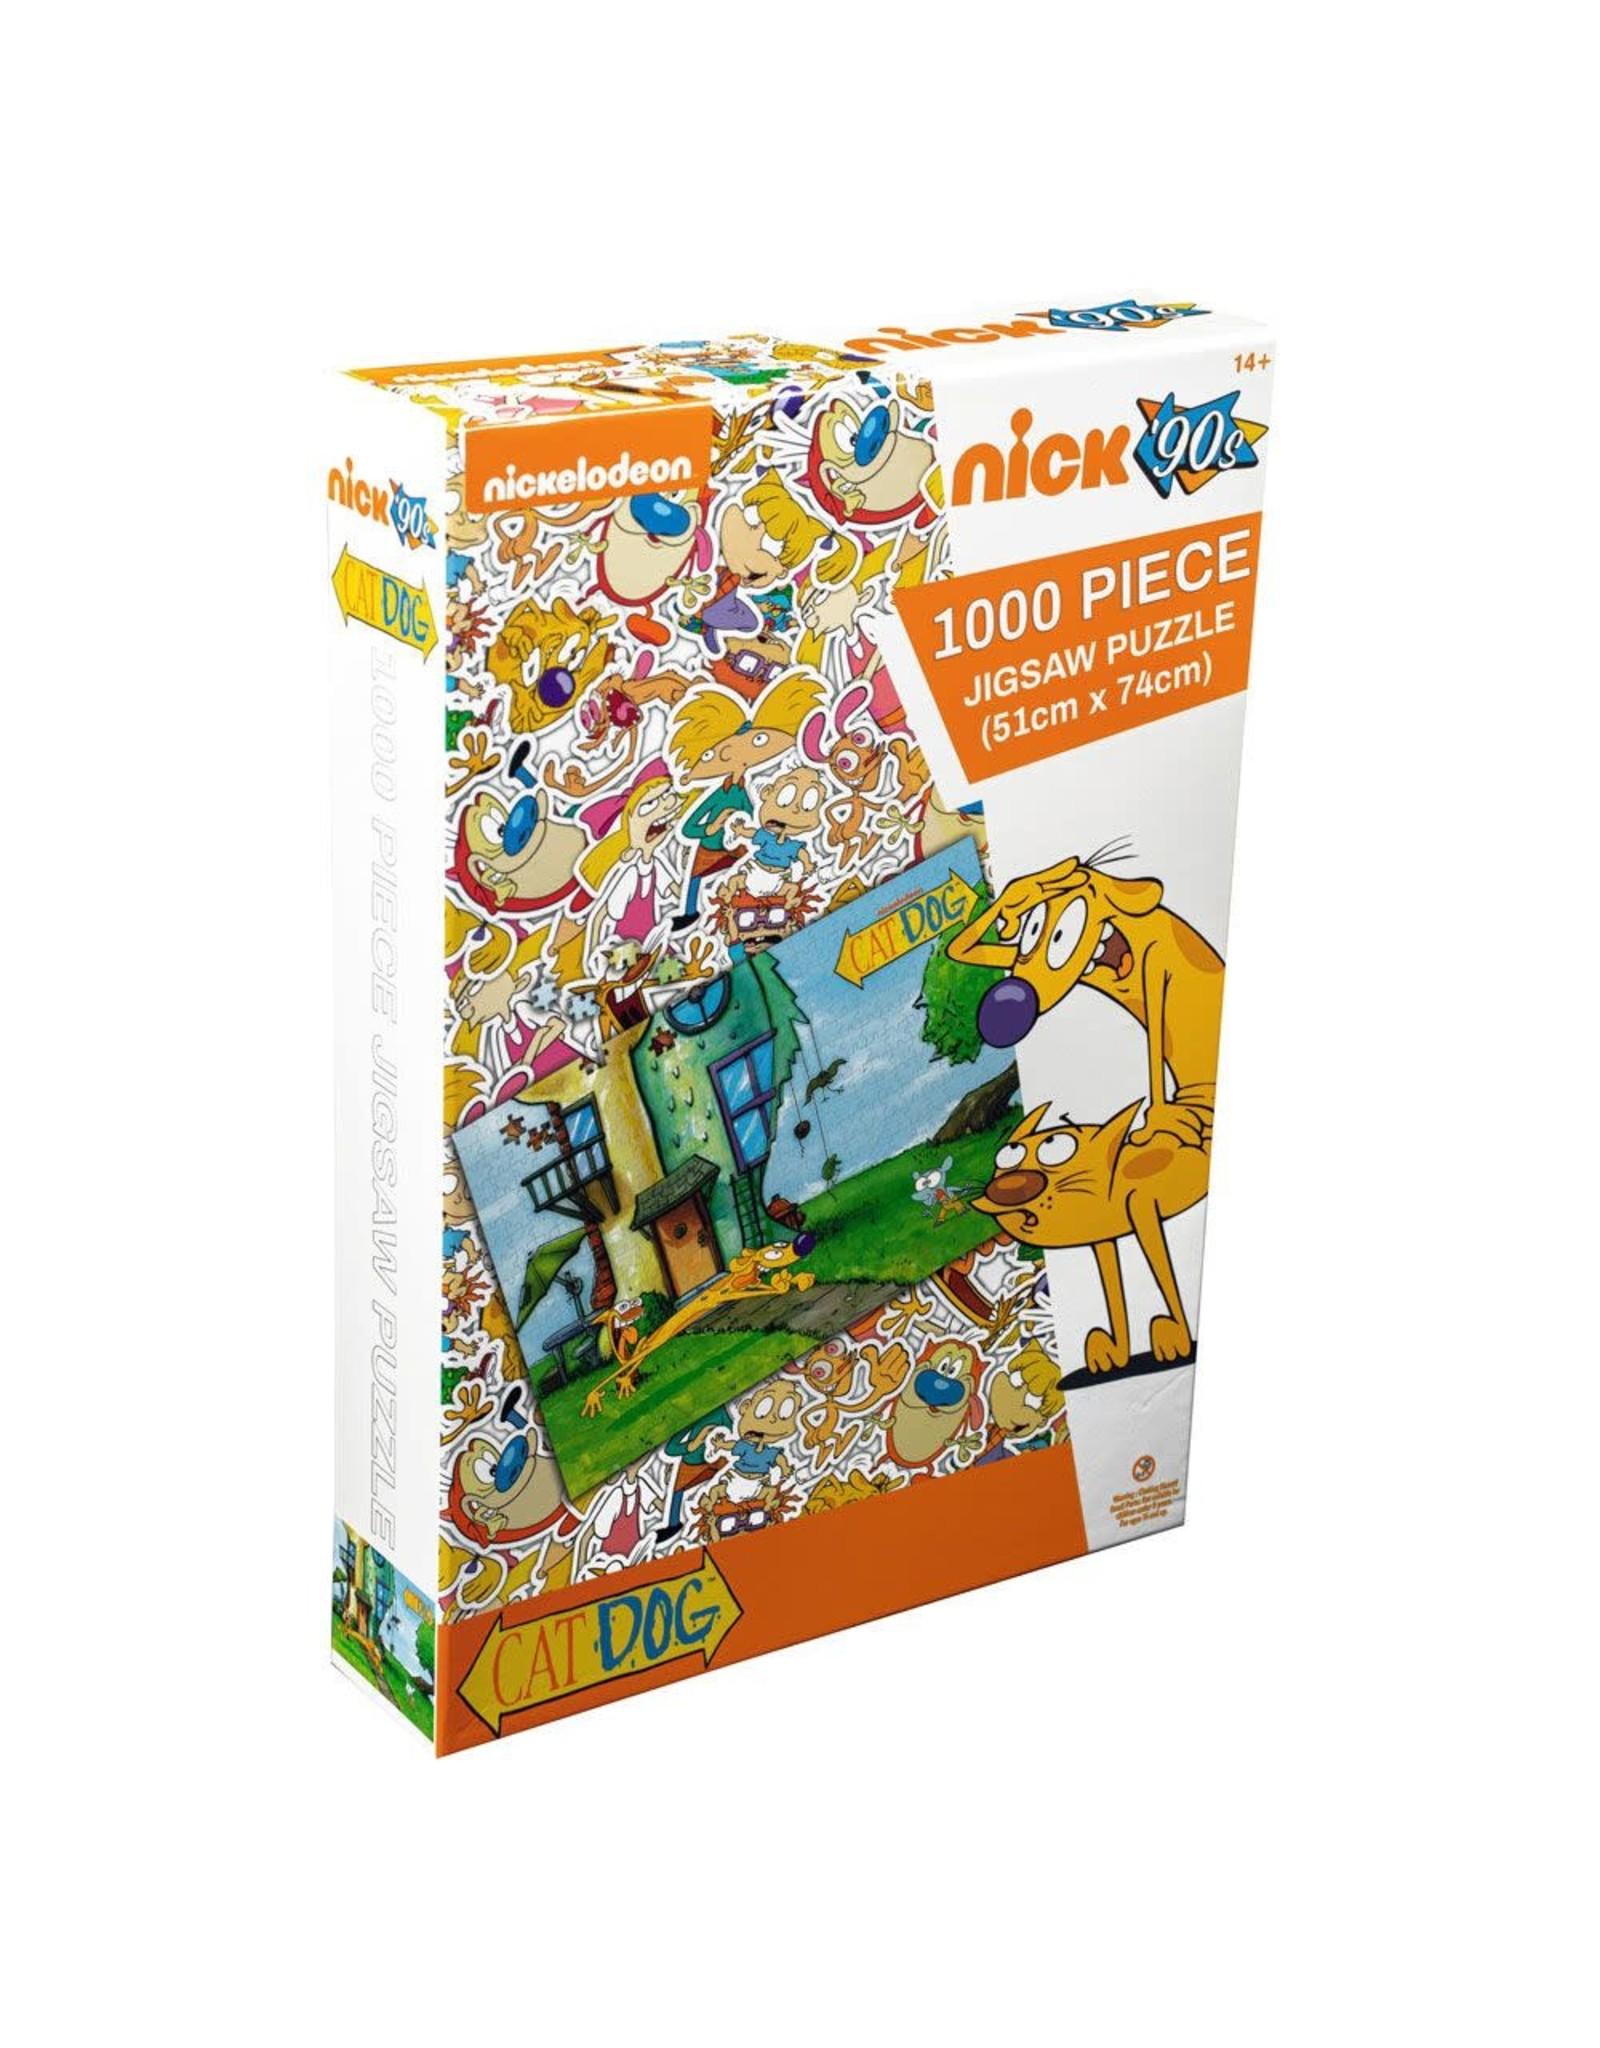 Ikon Collectables CATDOG Puzzle 1000P - Yard